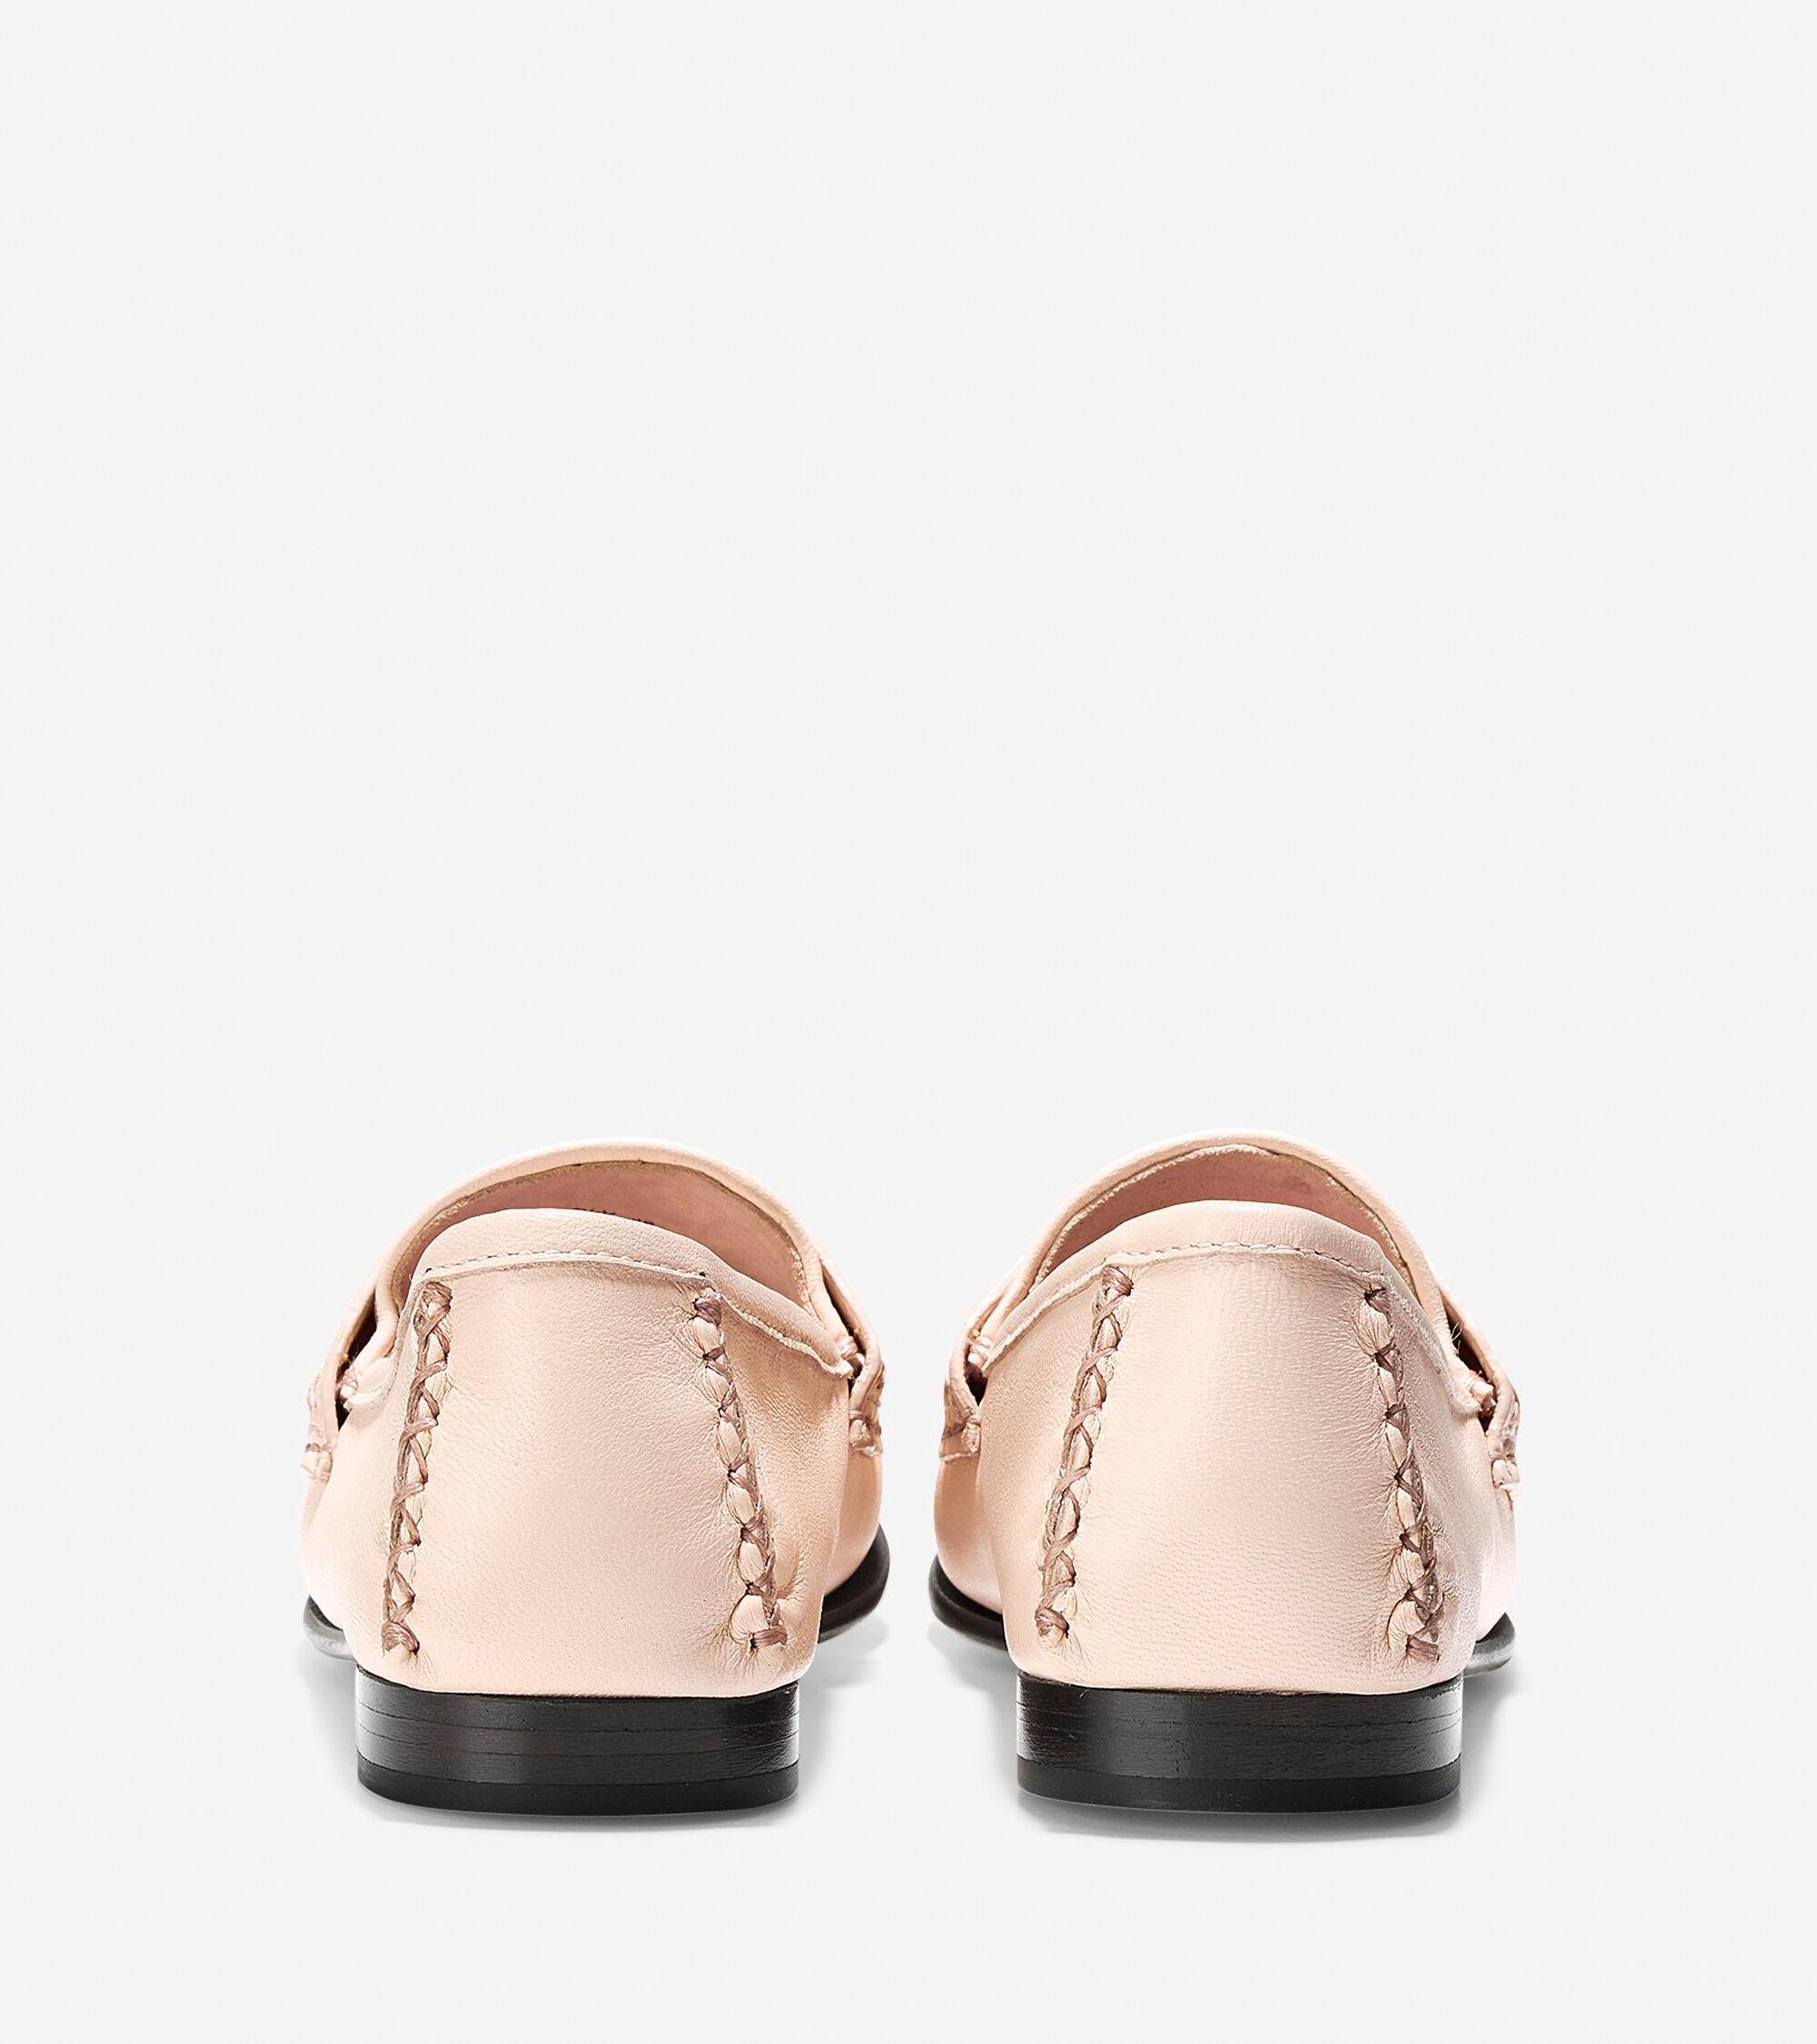 9cc589e9893 Women s Jagger Soft Weave Loafers in Peach Blush